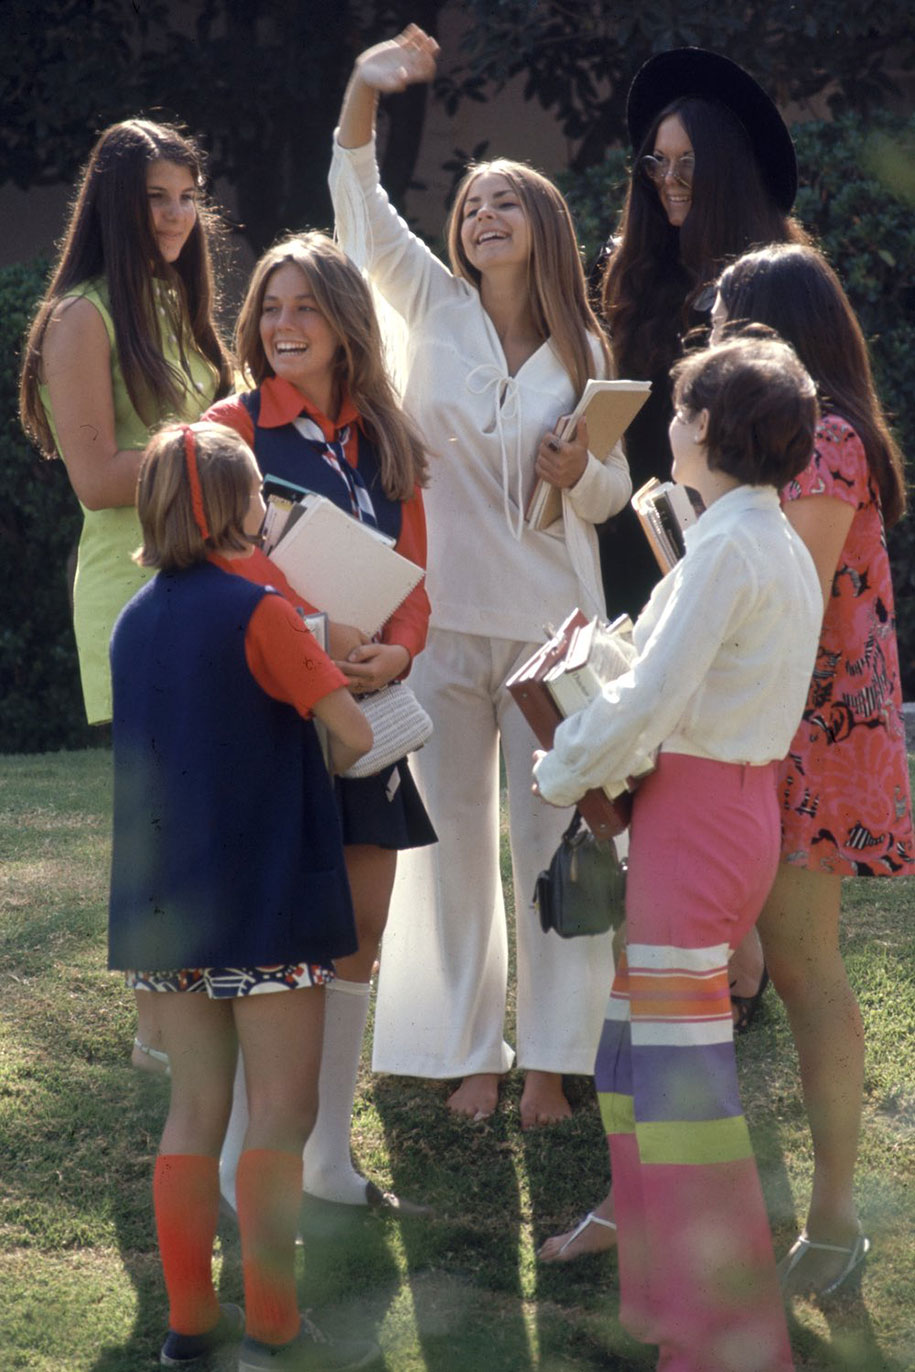 1969-hippie-high-school-counterculture-photography-11